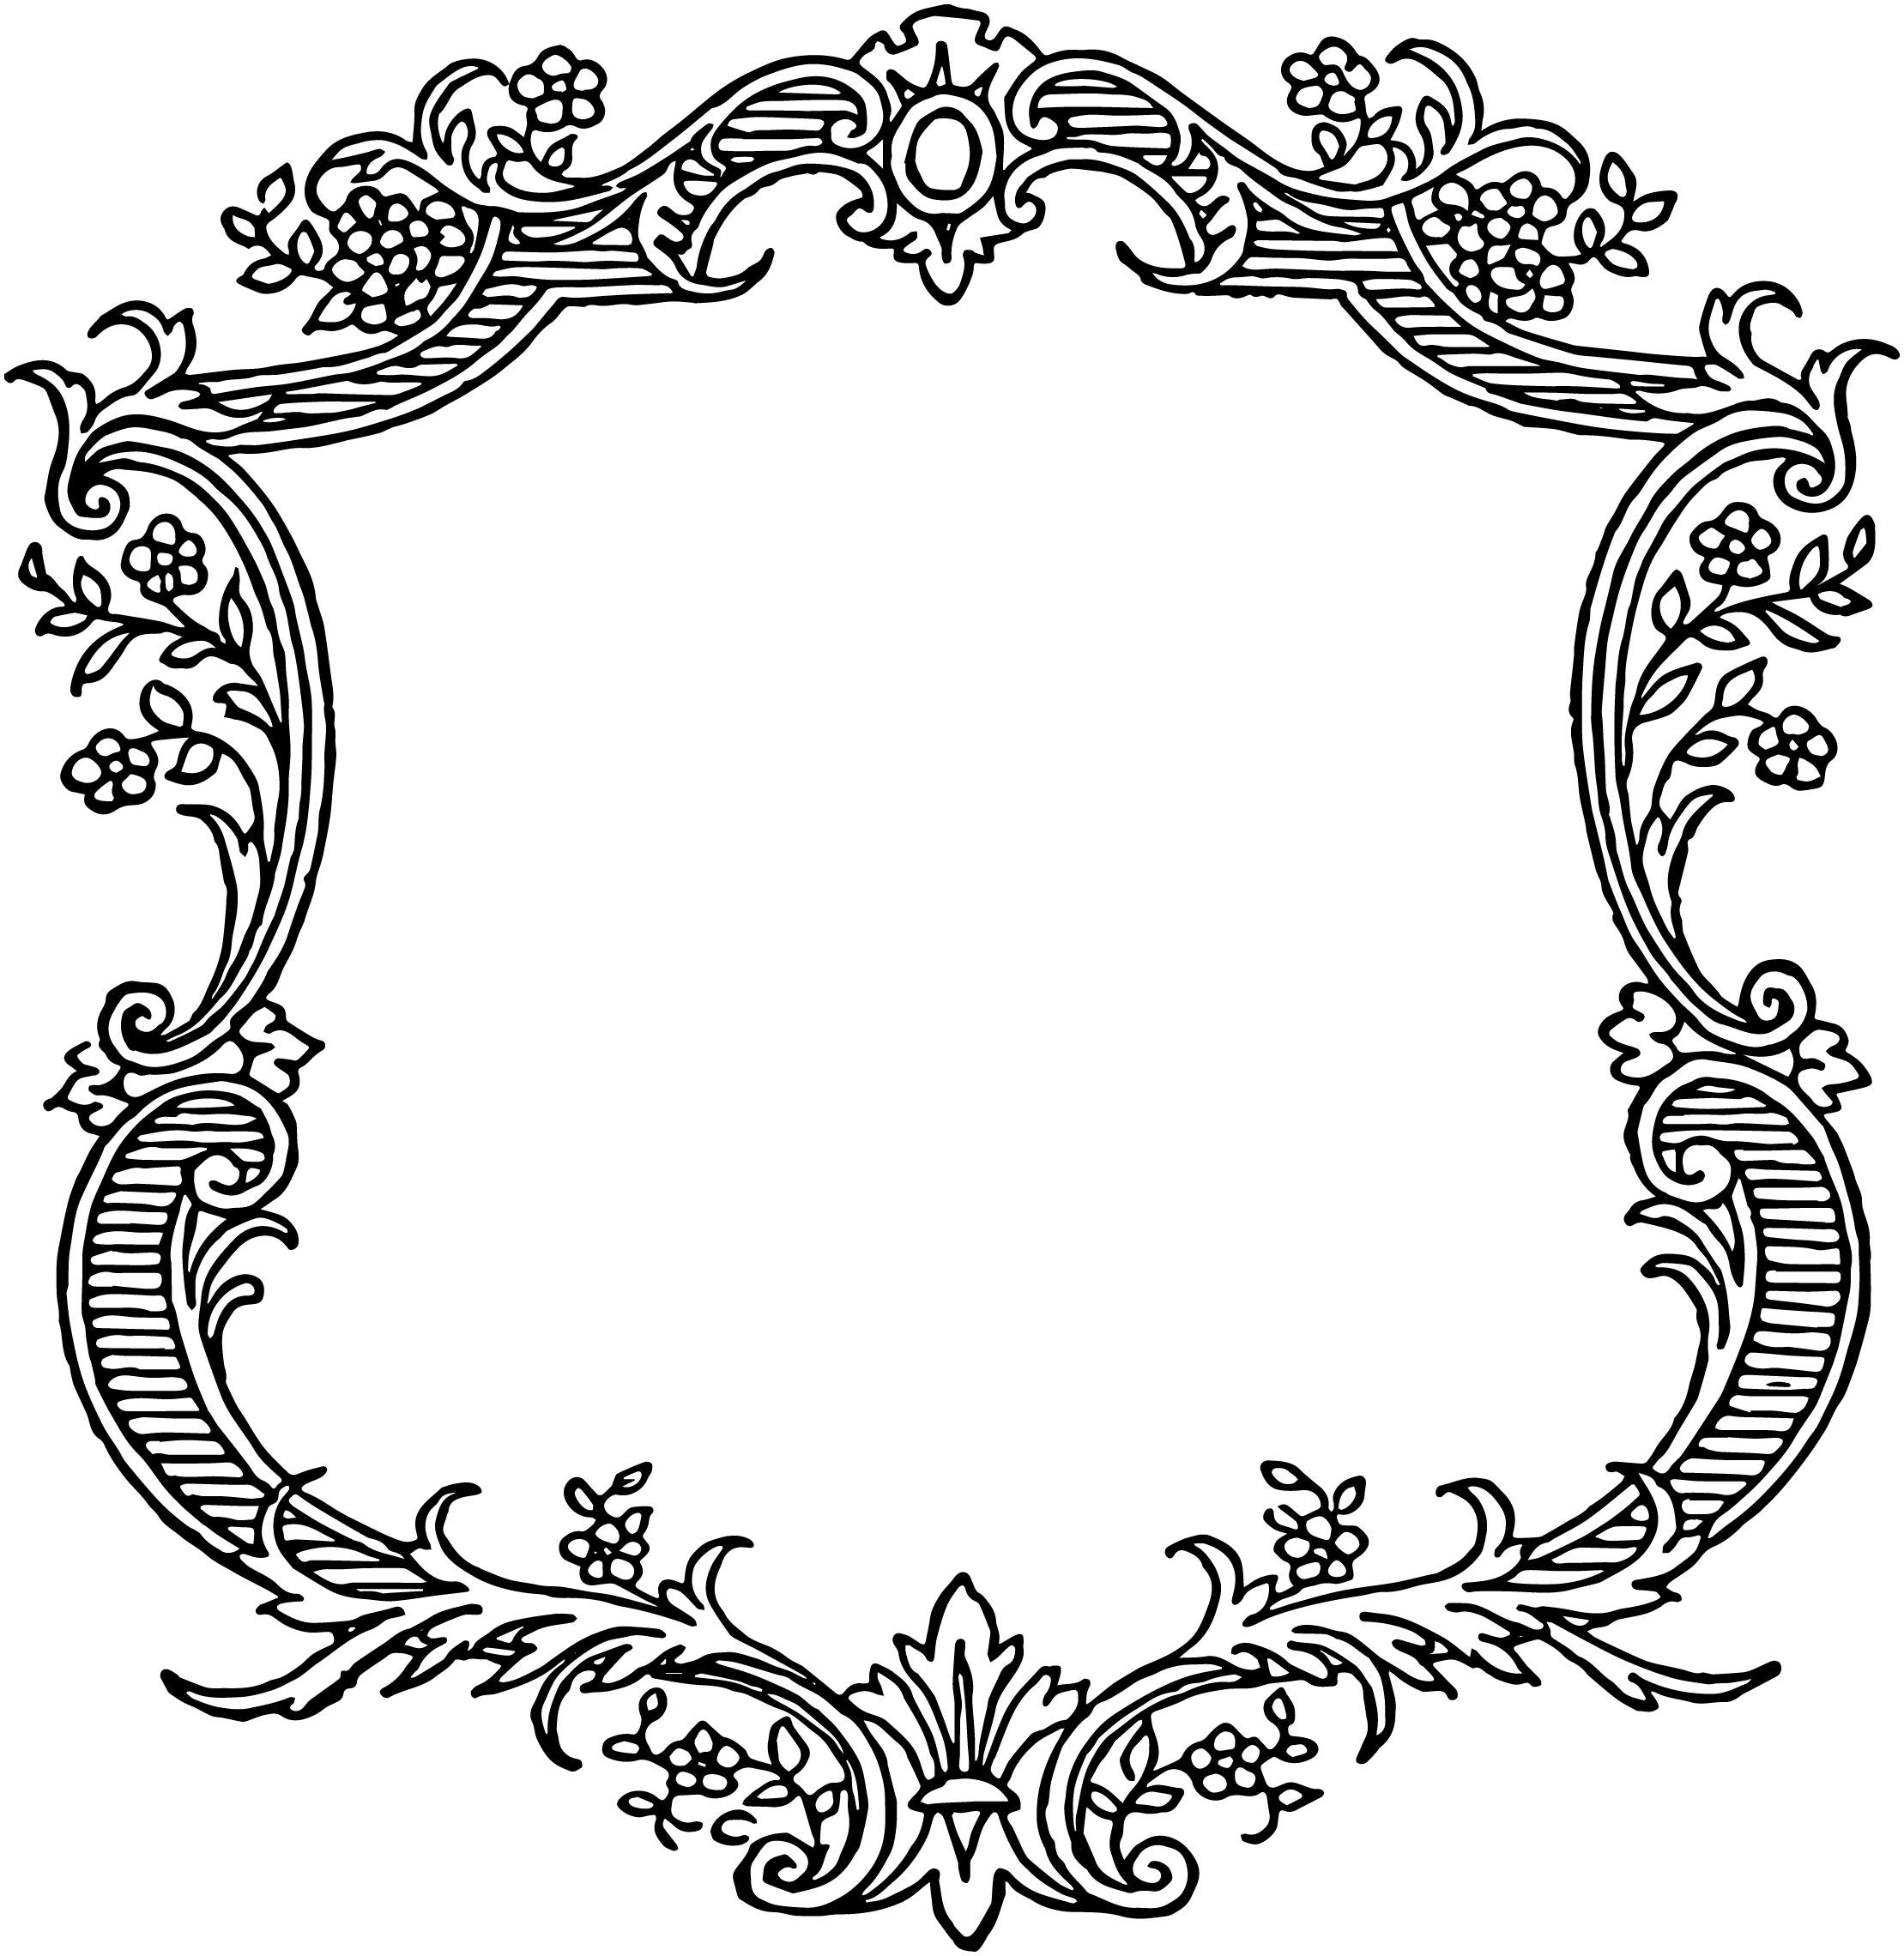 Free Scroll Borders, Download Free Clip Art, Free Clip Art.